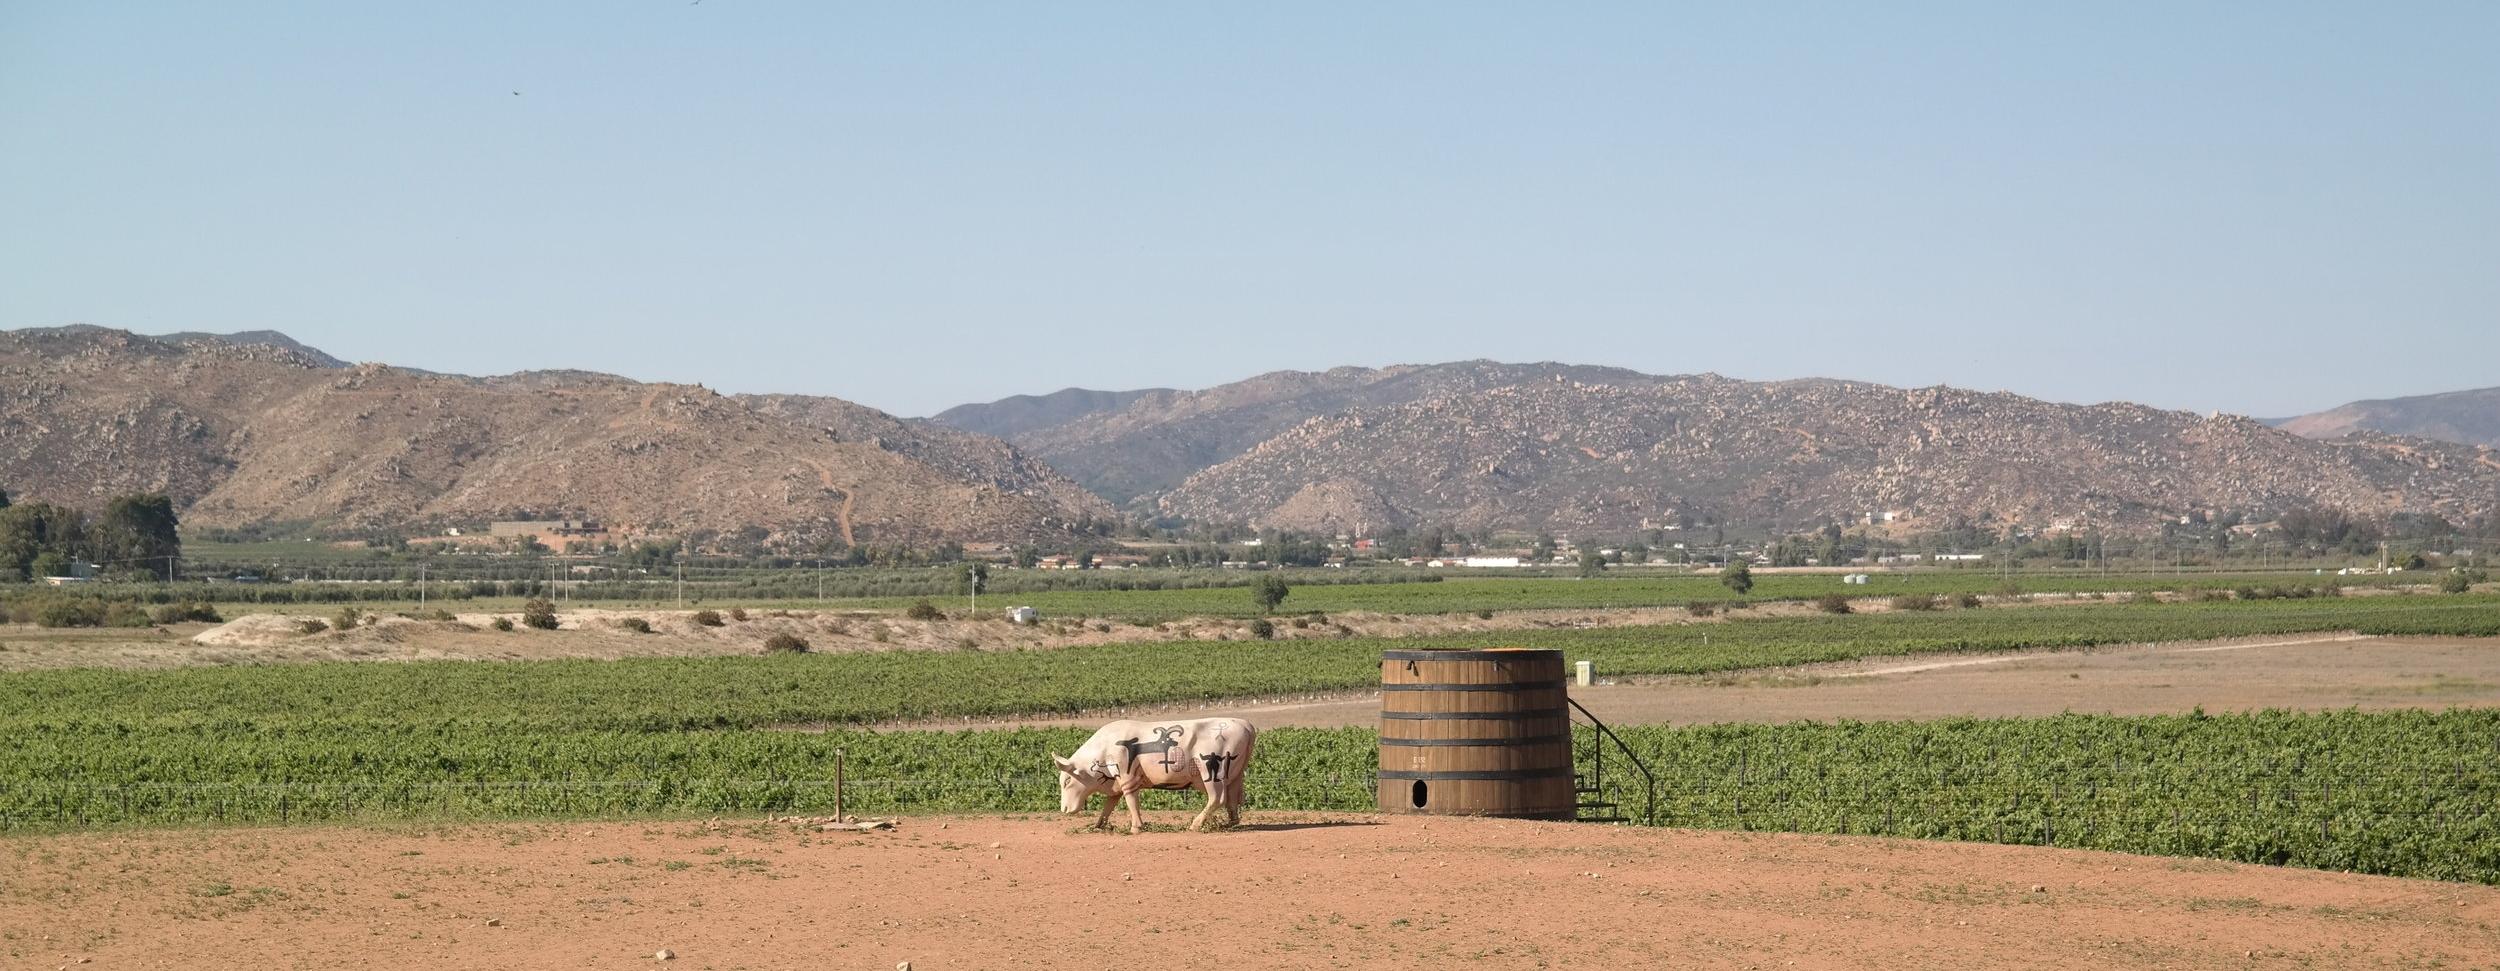 Finca Altozano Farm to table restaurant and Vineyard